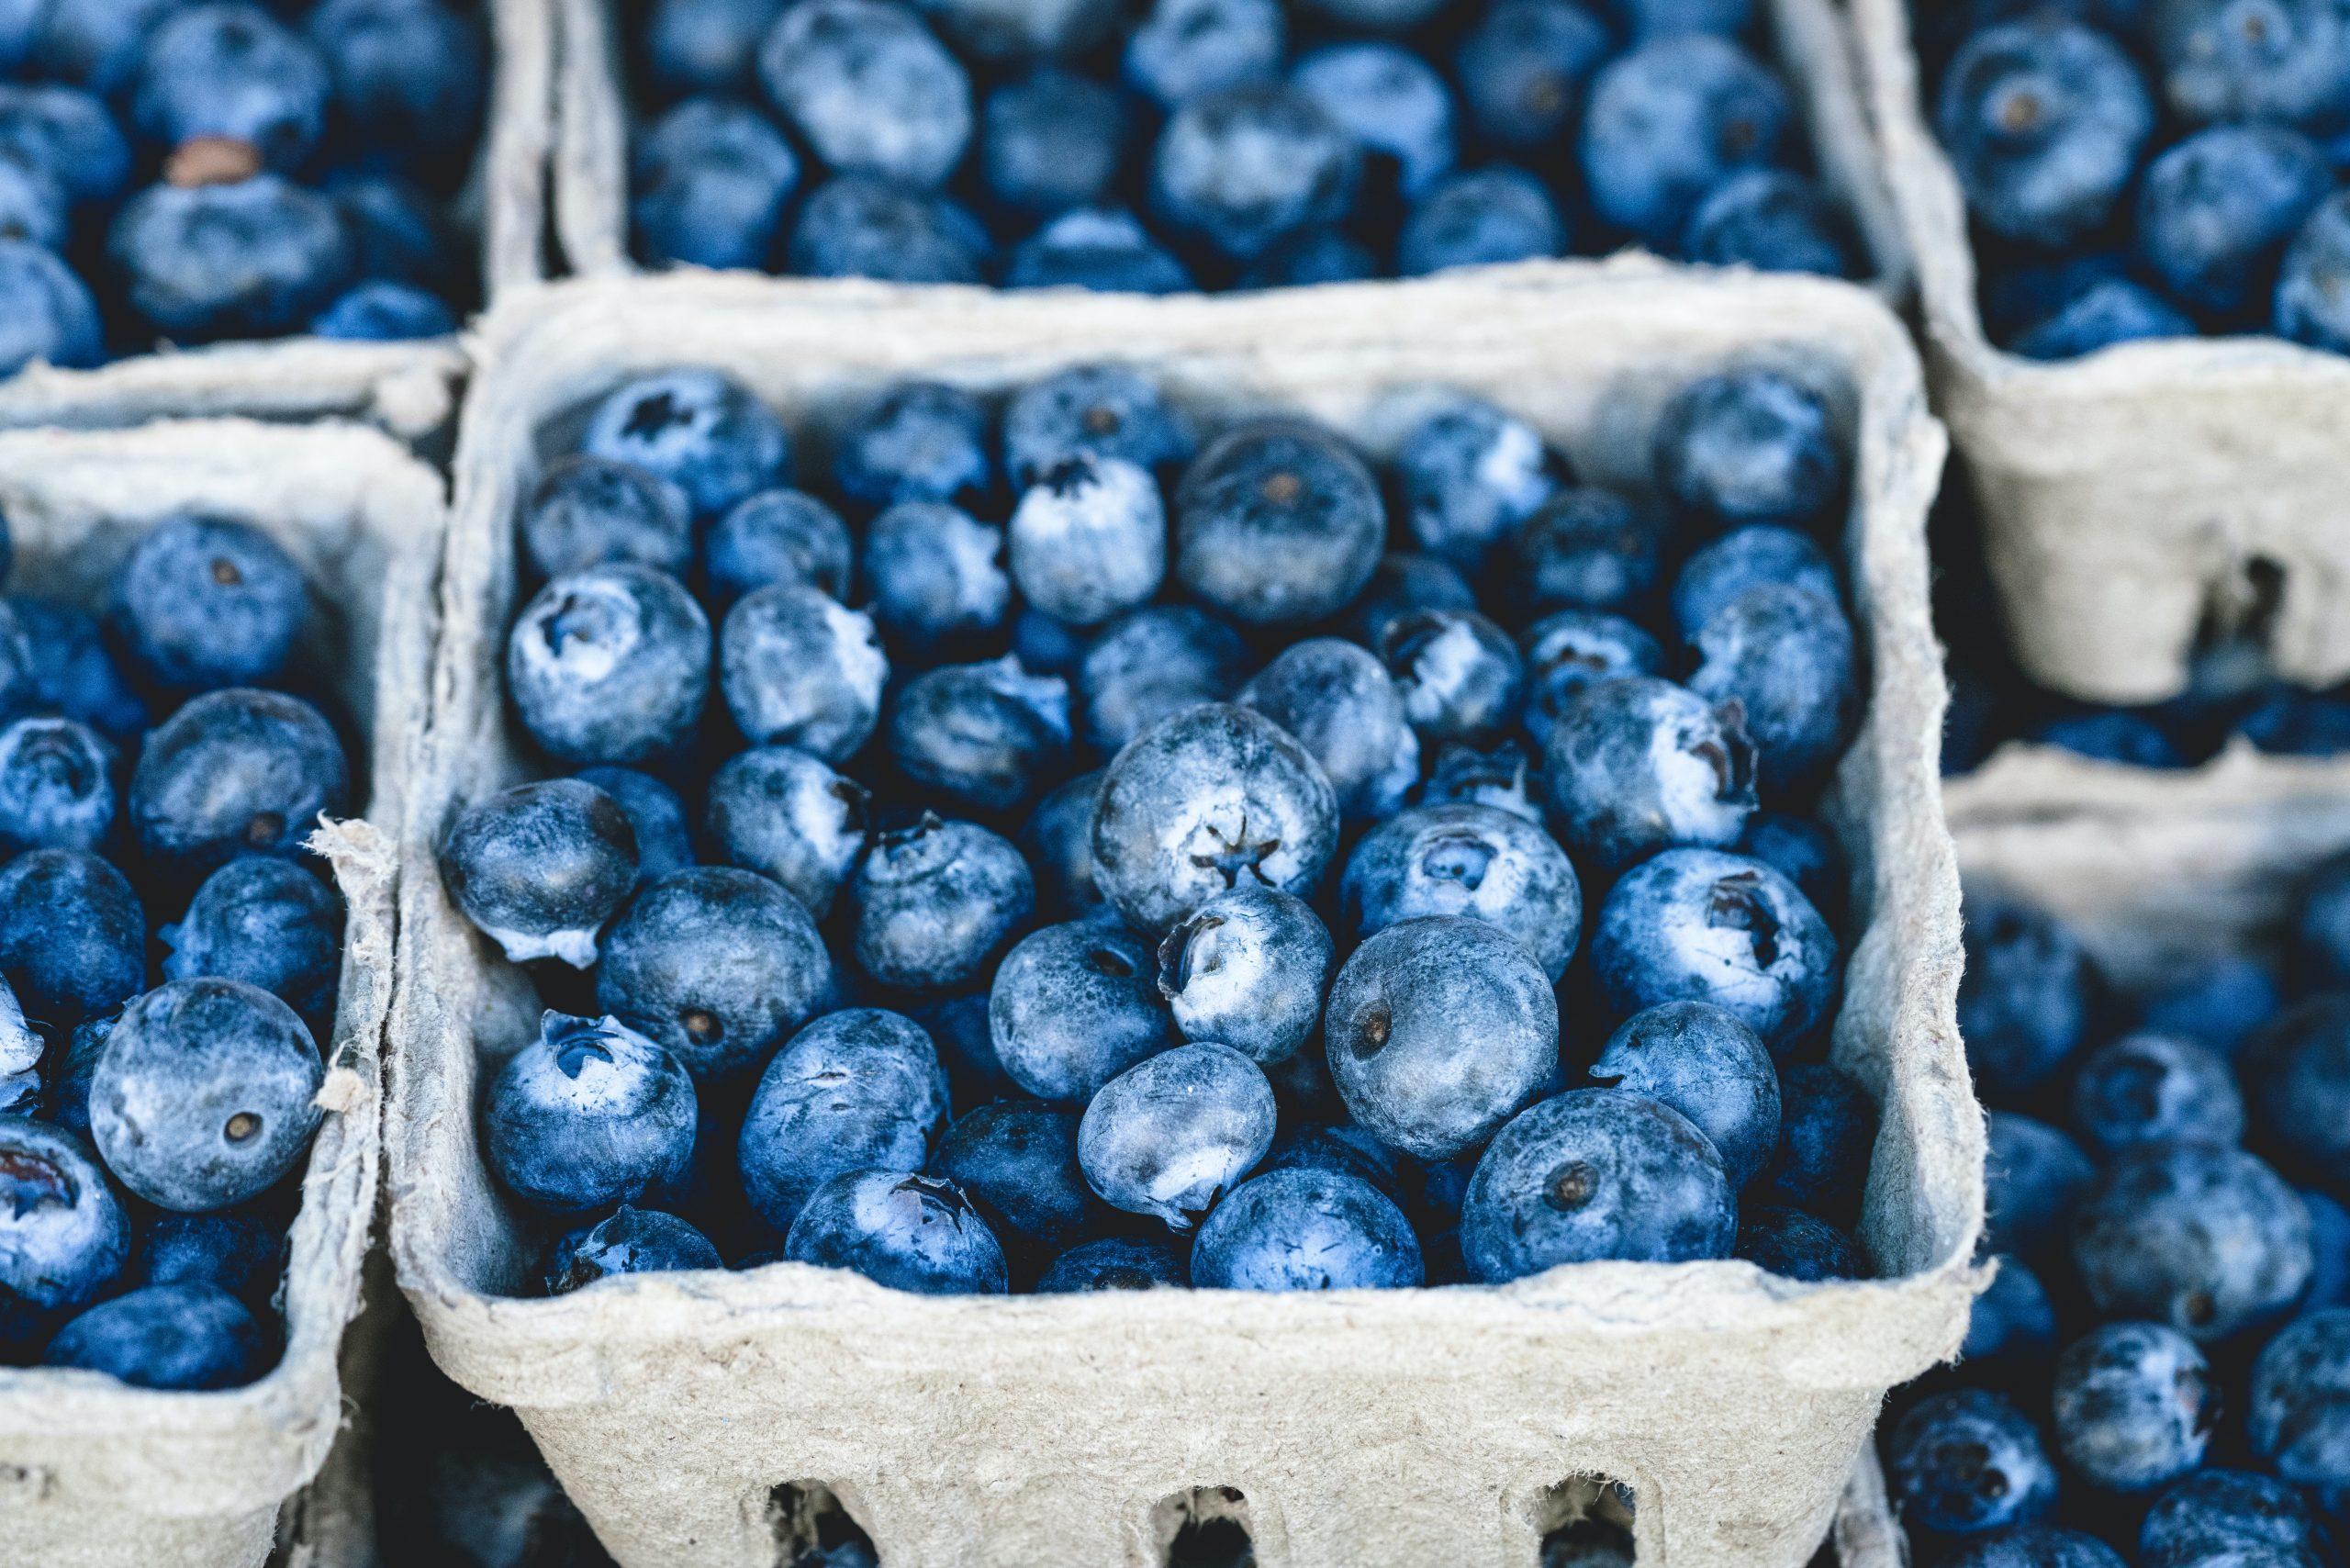 Blueberries The World's Tastiest Super Food